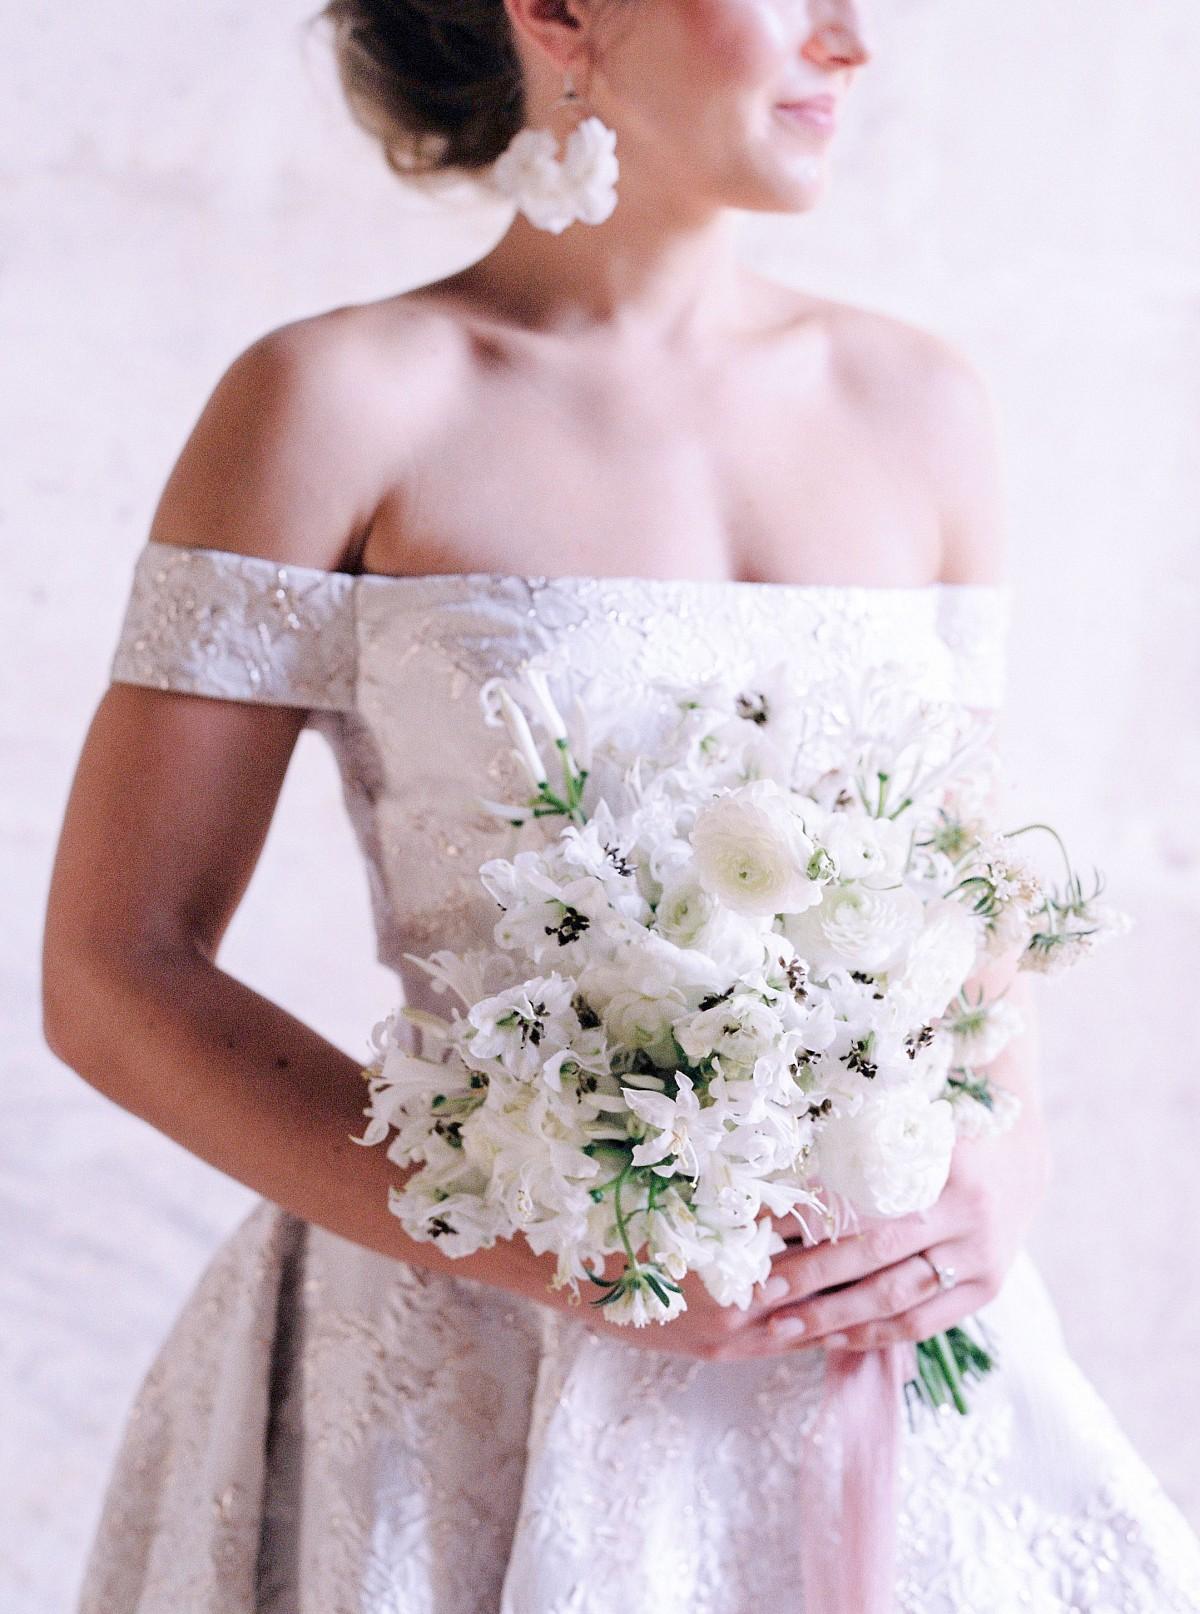 No Cell Phones at Wedding - Rachel McCarthy Photography - Paris Wedding Photographer